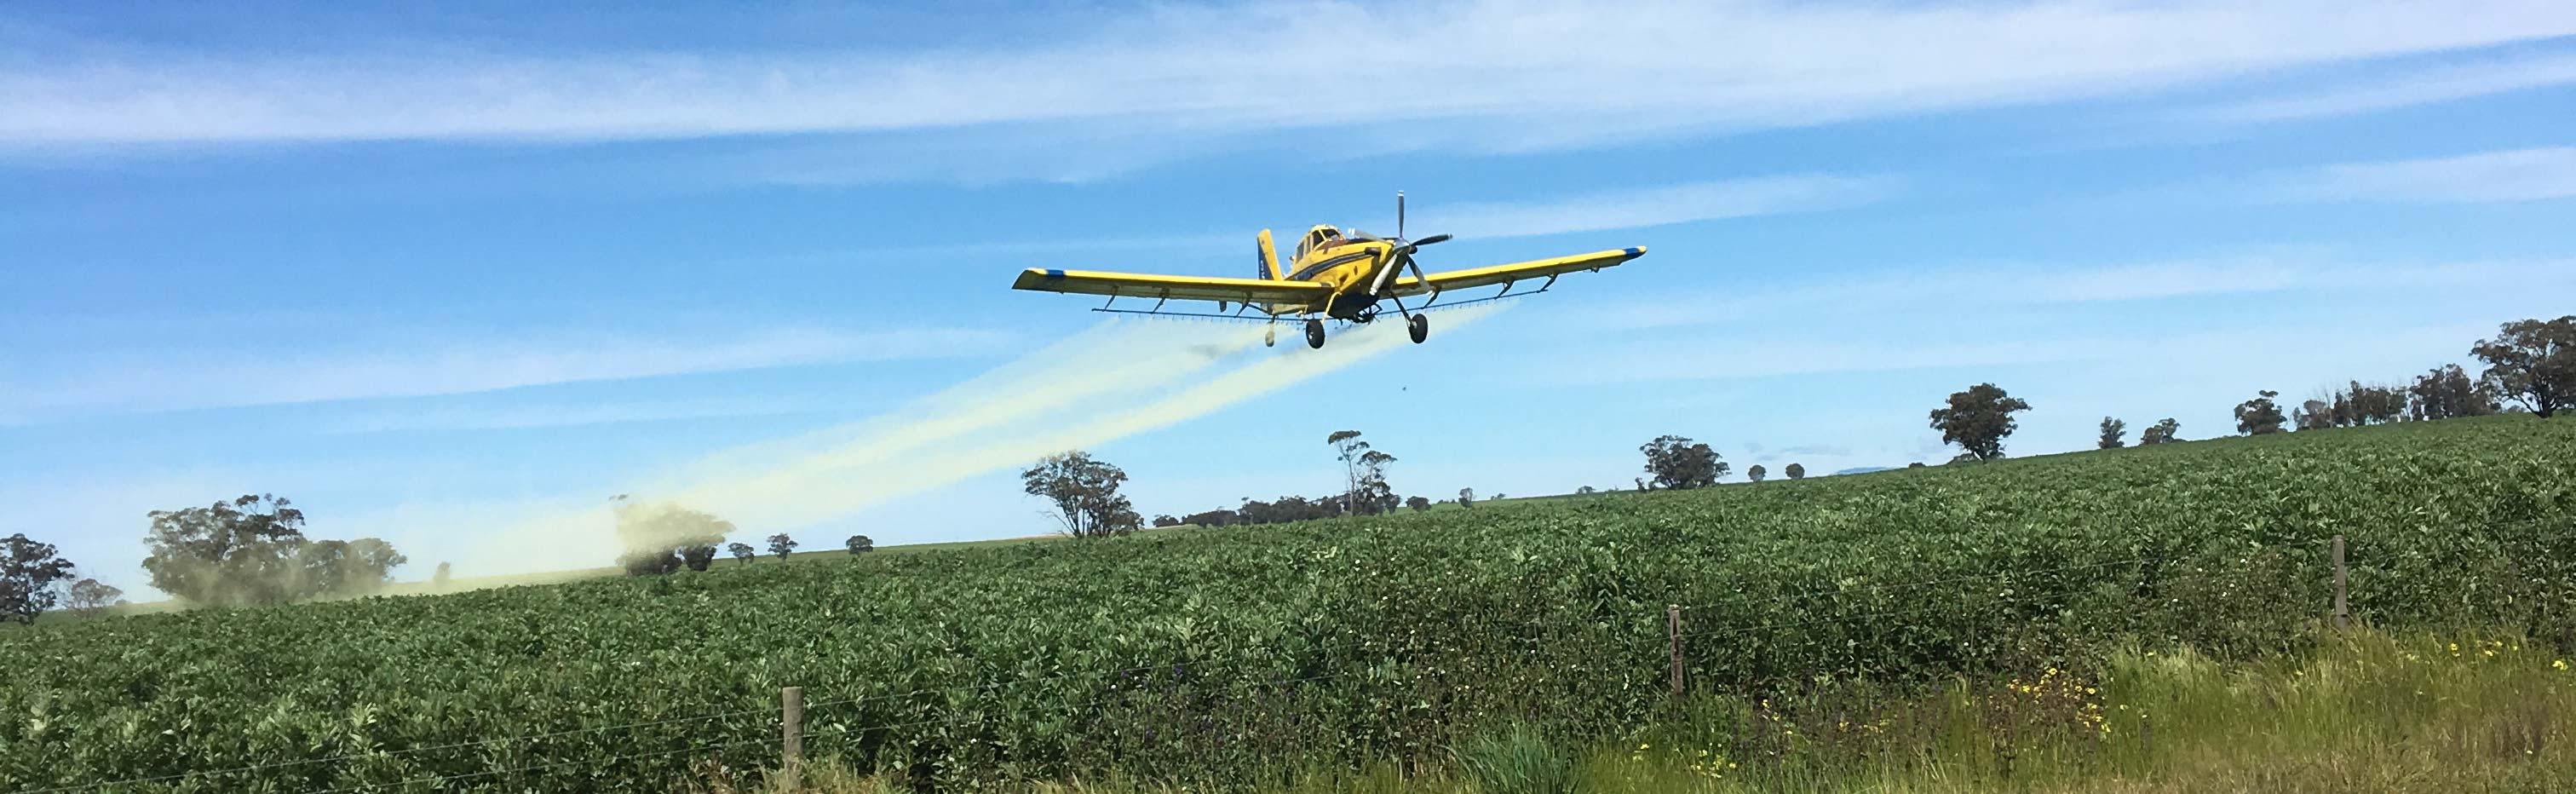 AG Airwork img of plane spraying crops